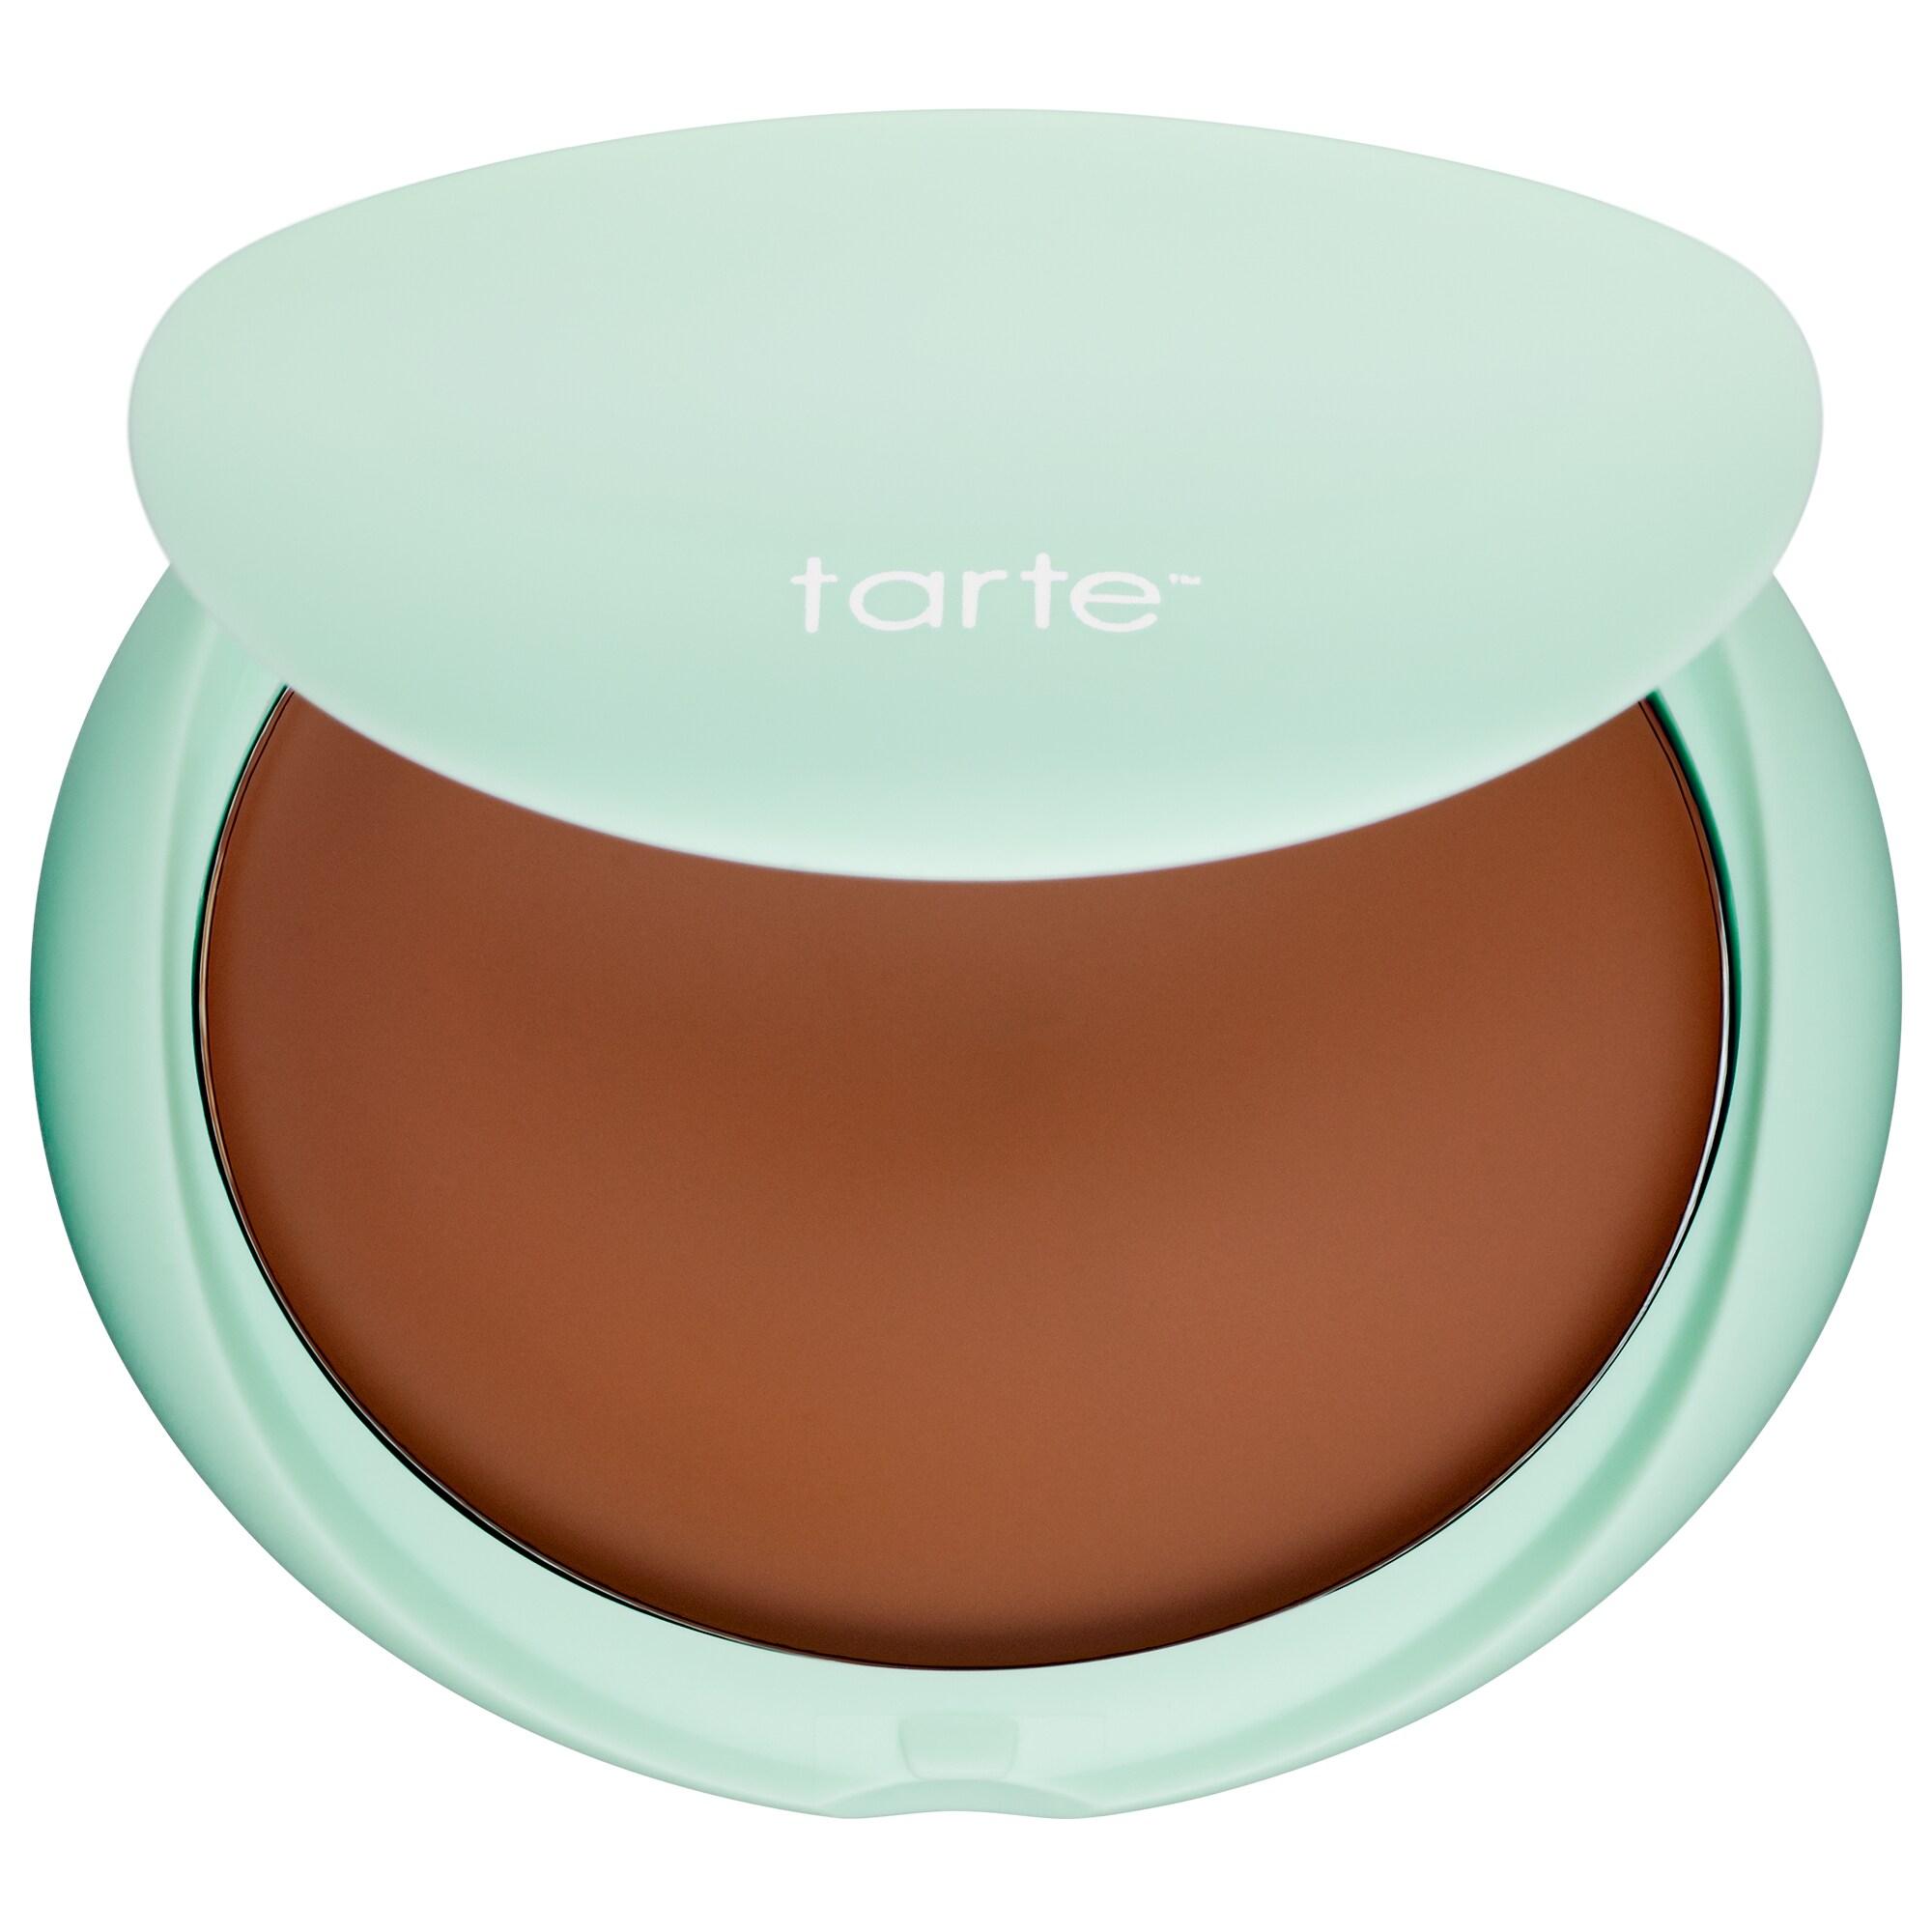 Tarte - SEA Breezy Cream Bronzer